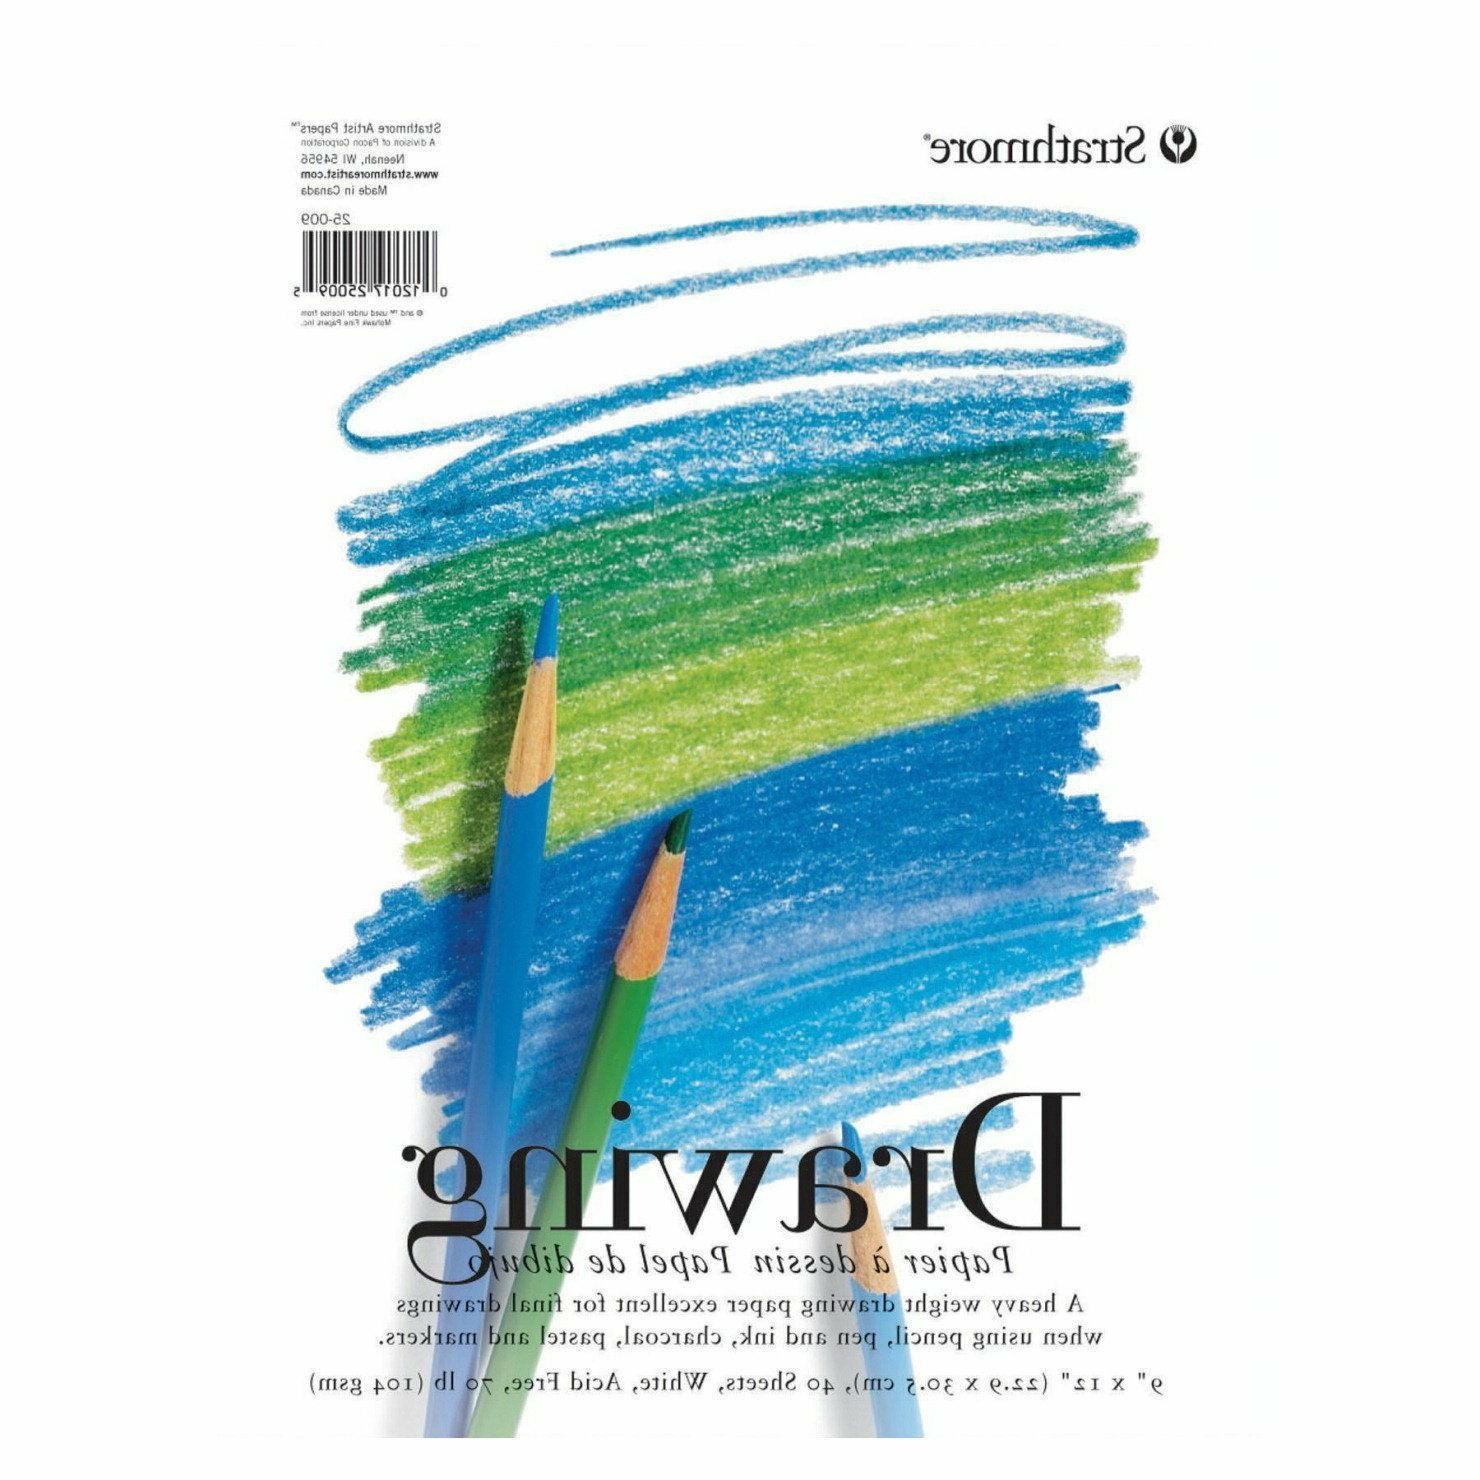 Drawing Paper Pad 9 x 12 40 Sheet 70 lb Colored Pencil Marke